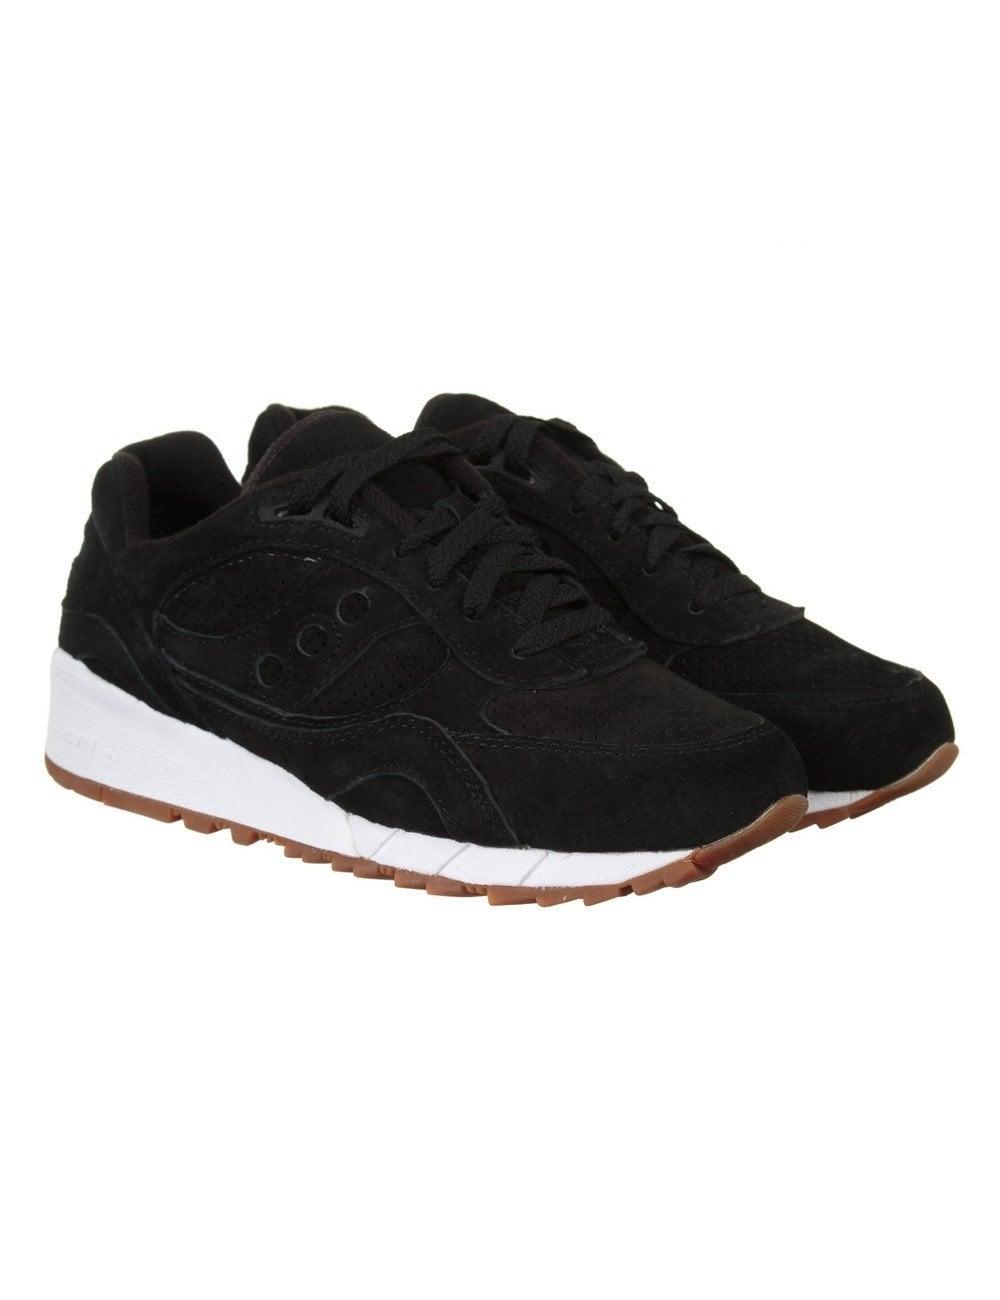 f0178635f956 Saucony Shadow 6000 Shoes - Black Coffee (Irish Coffee Pack ...